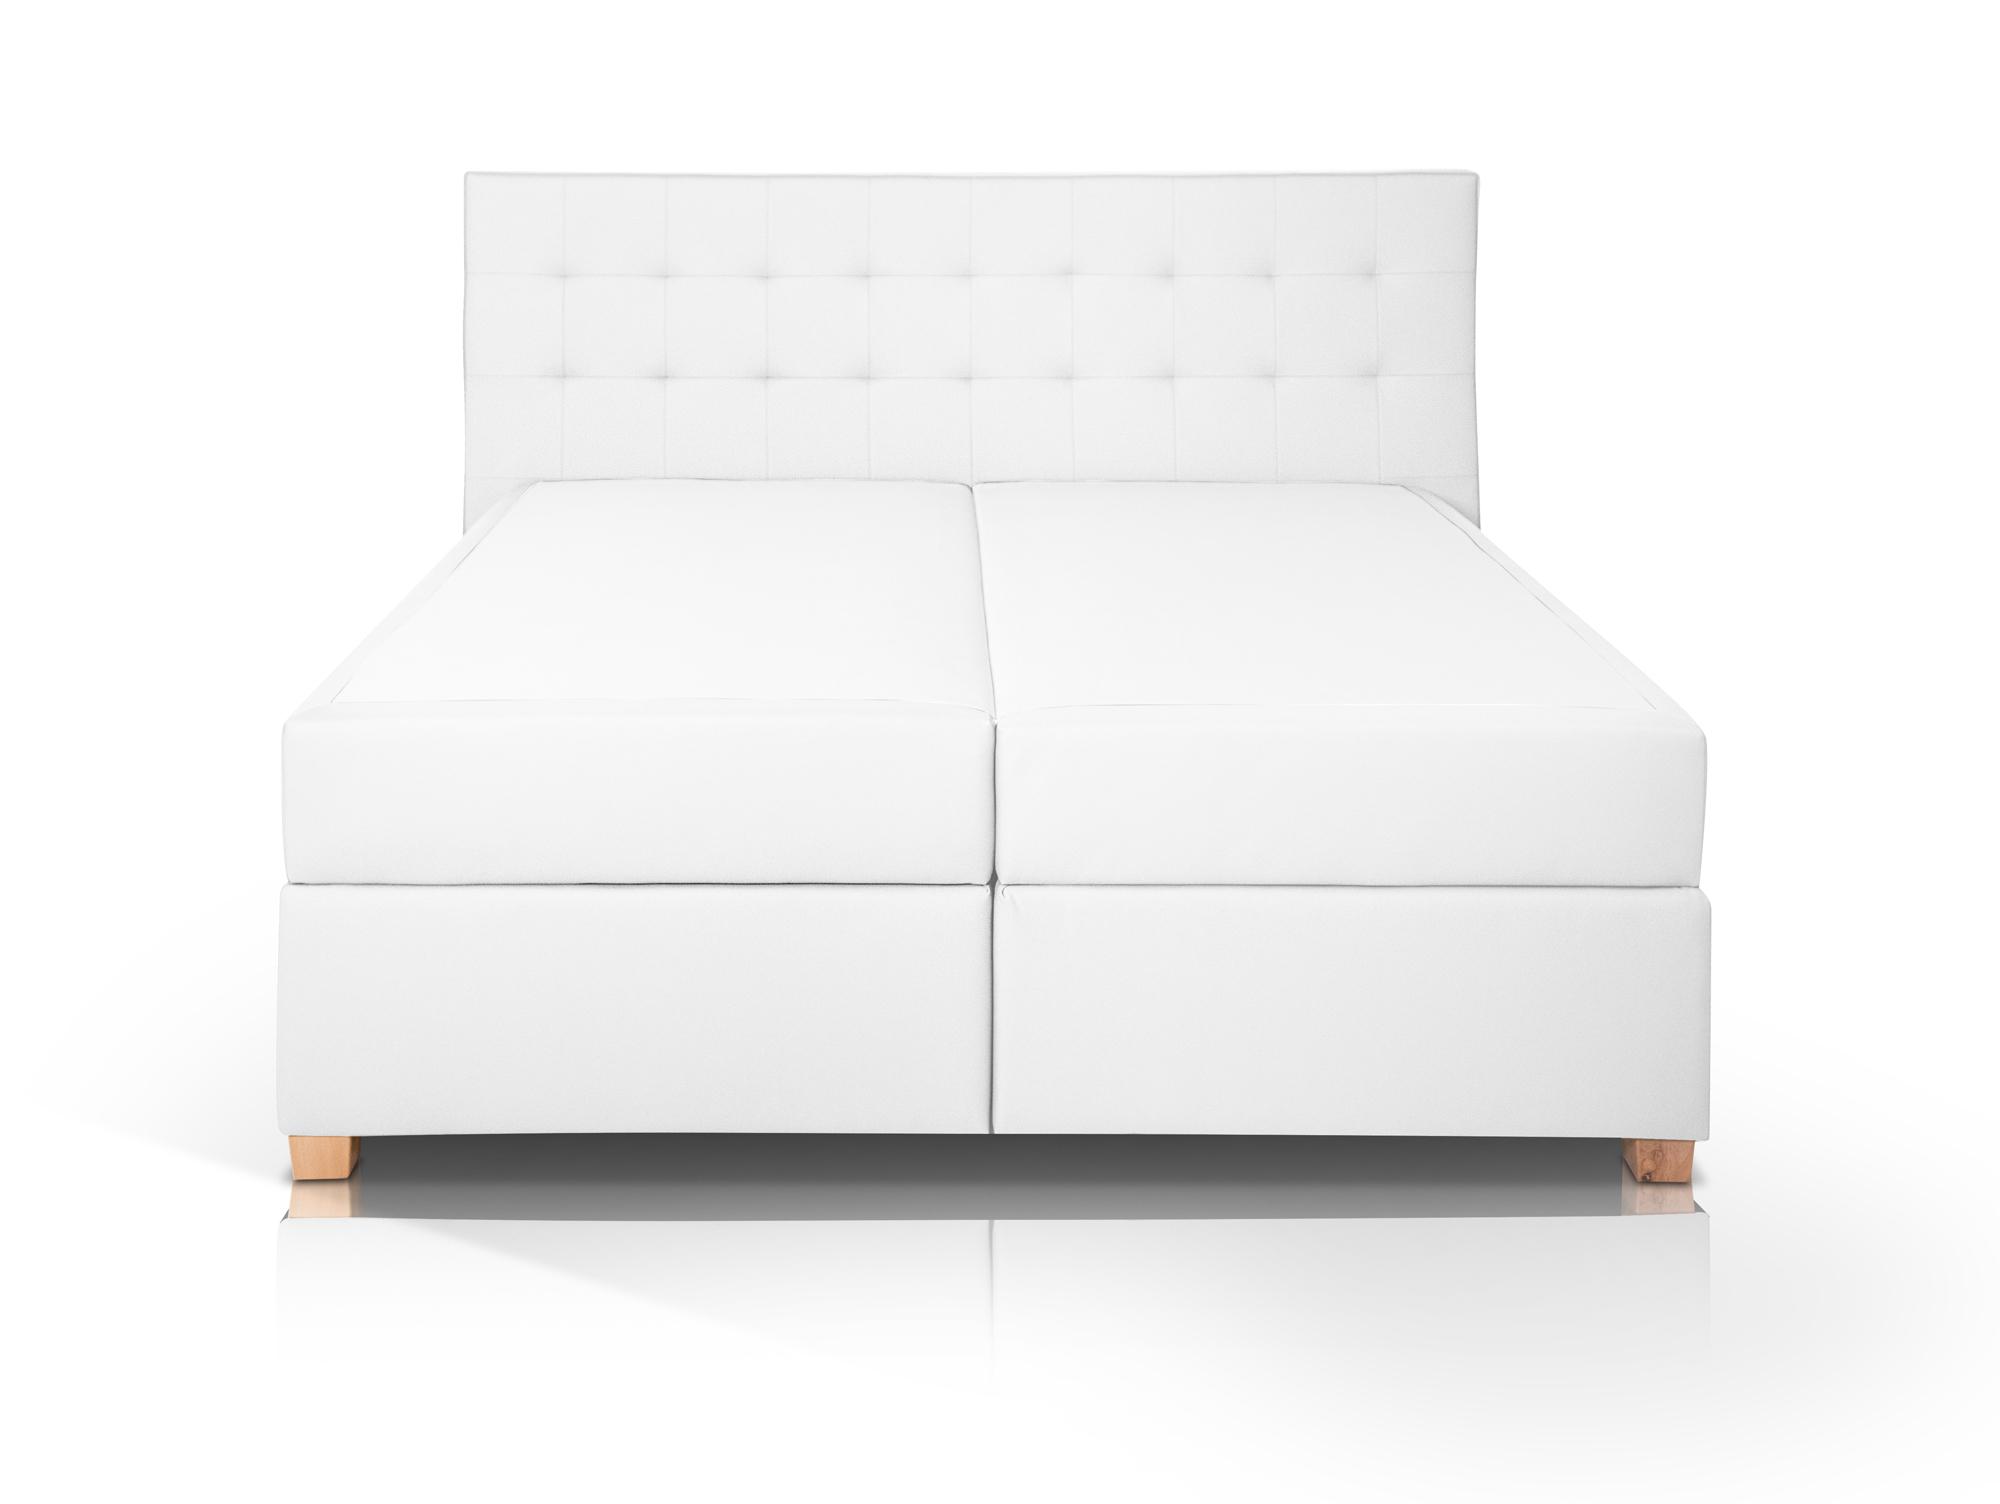 ida boxspringbett kunstleder mit bettkasten 160 x 200 cm weiss h rtegrad 2. Black Bedroom Furniture Sets. Home Design Ideas